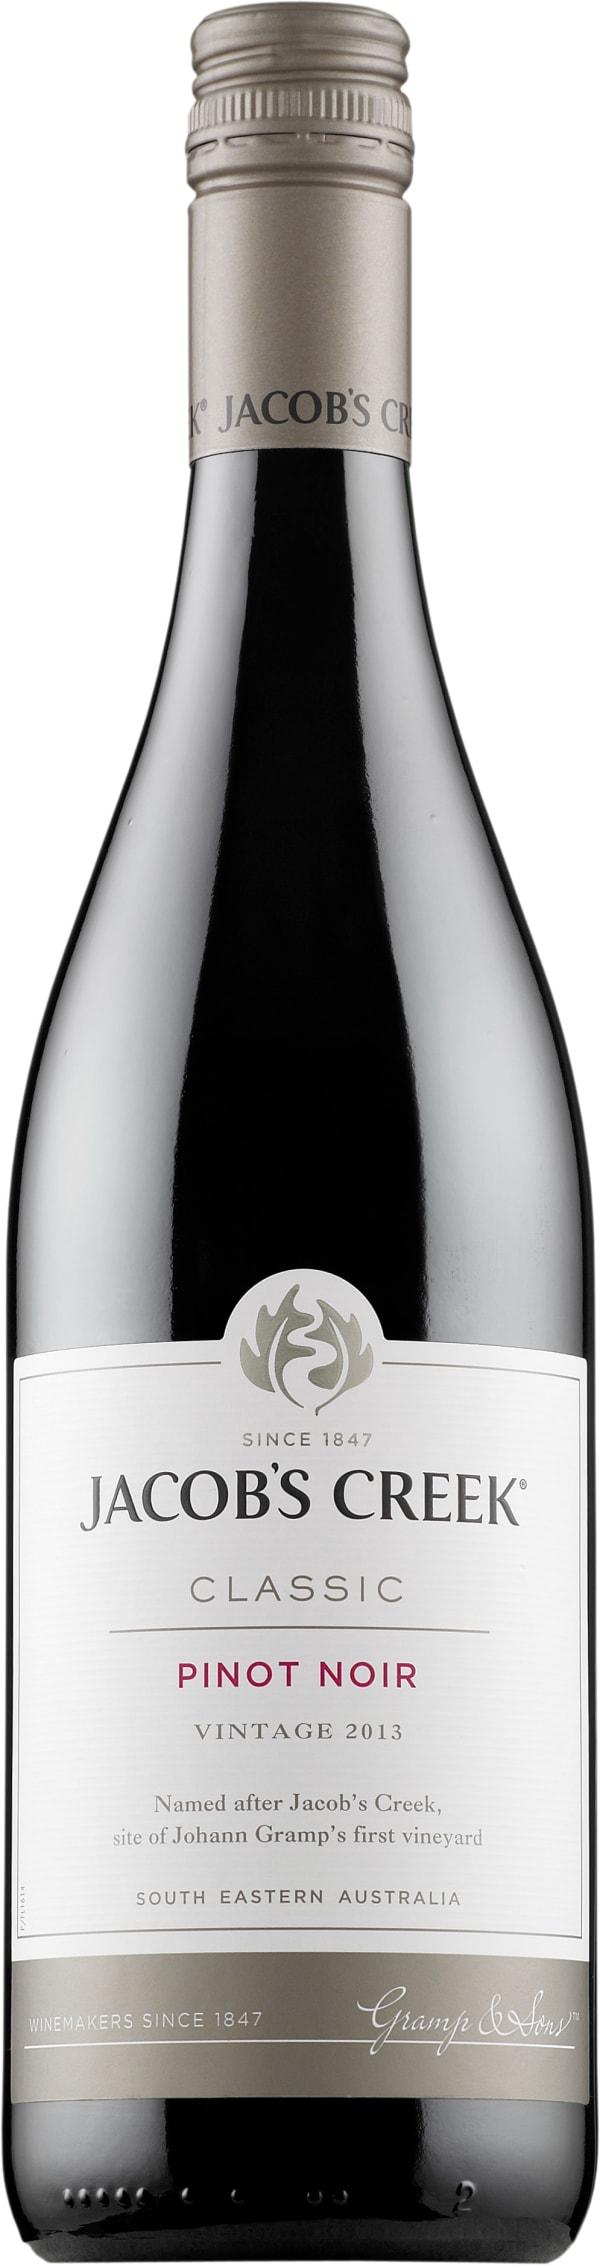 Jacob's Creek Pinot Noir 2019